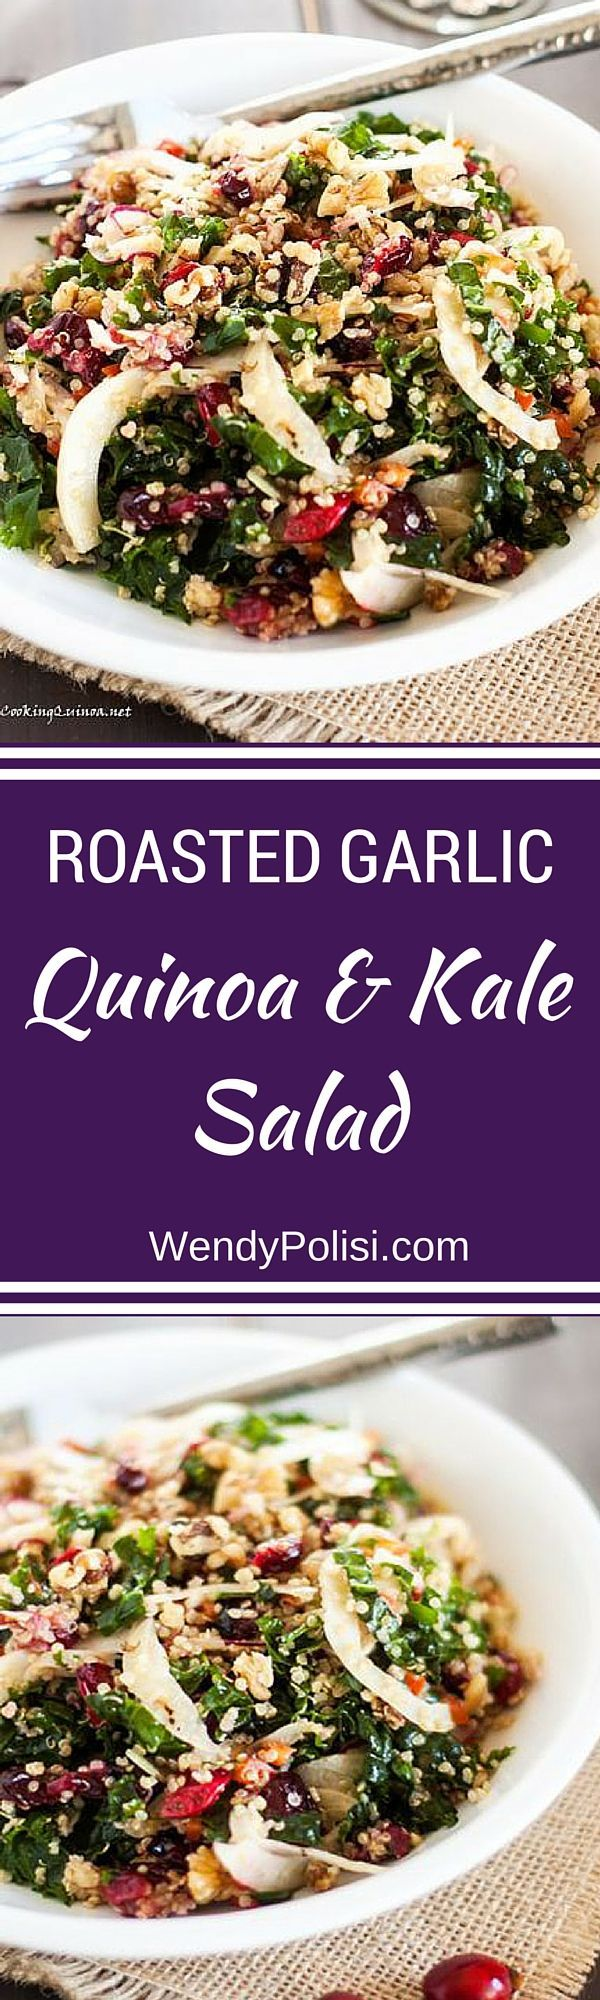 Roasted Garlic Quinoa & Kale Salad